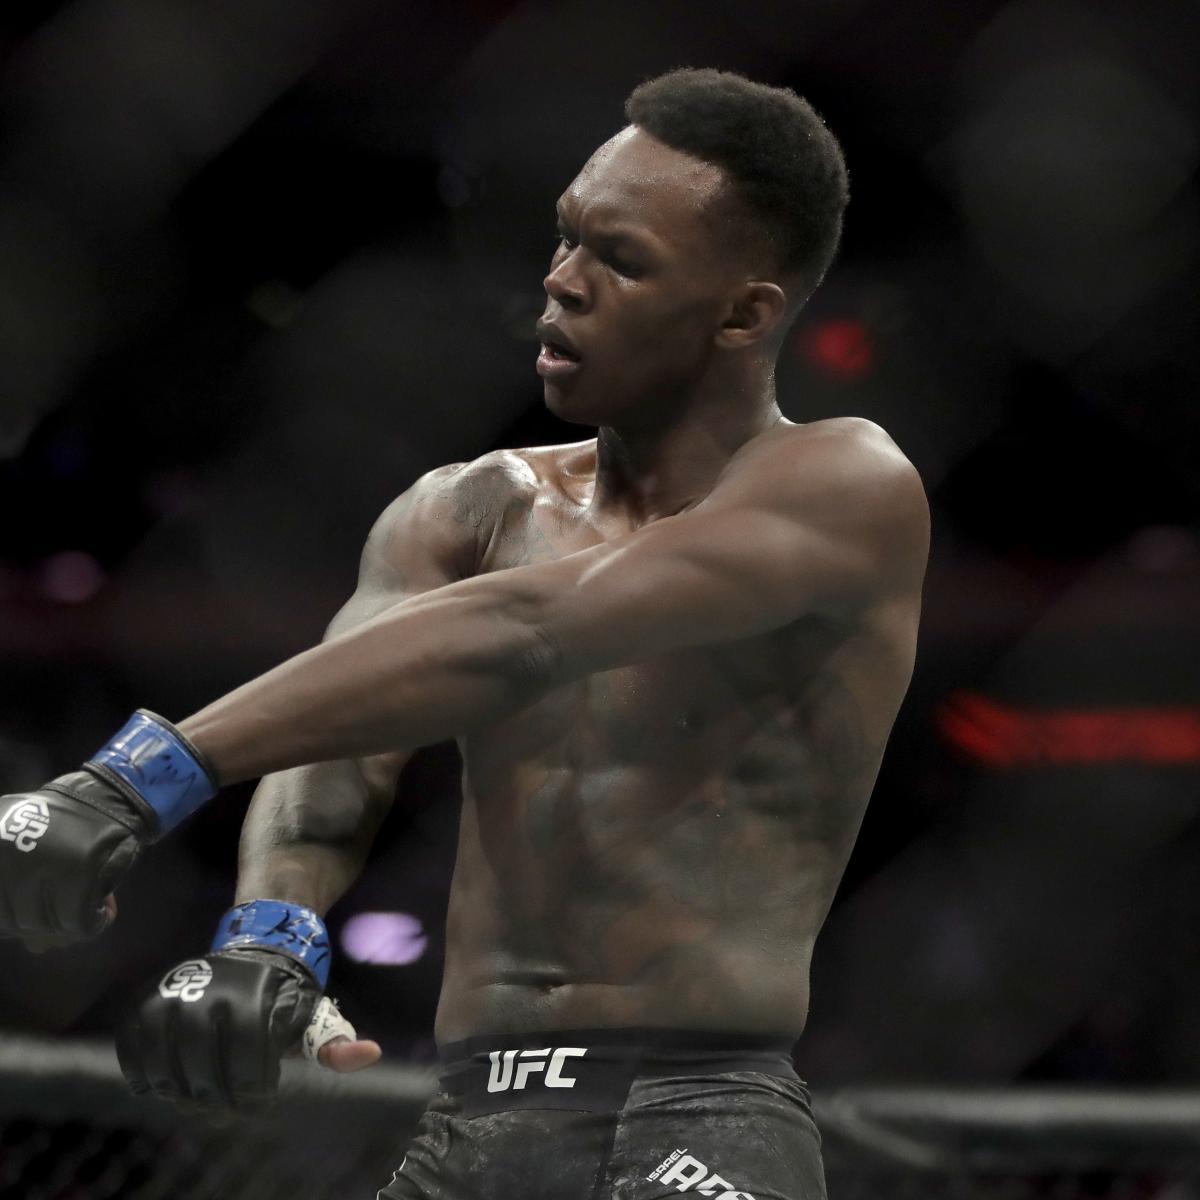 UFC's Israel Adesanya, Sijara Eubanks Slam Colby Covington over Racist Comments